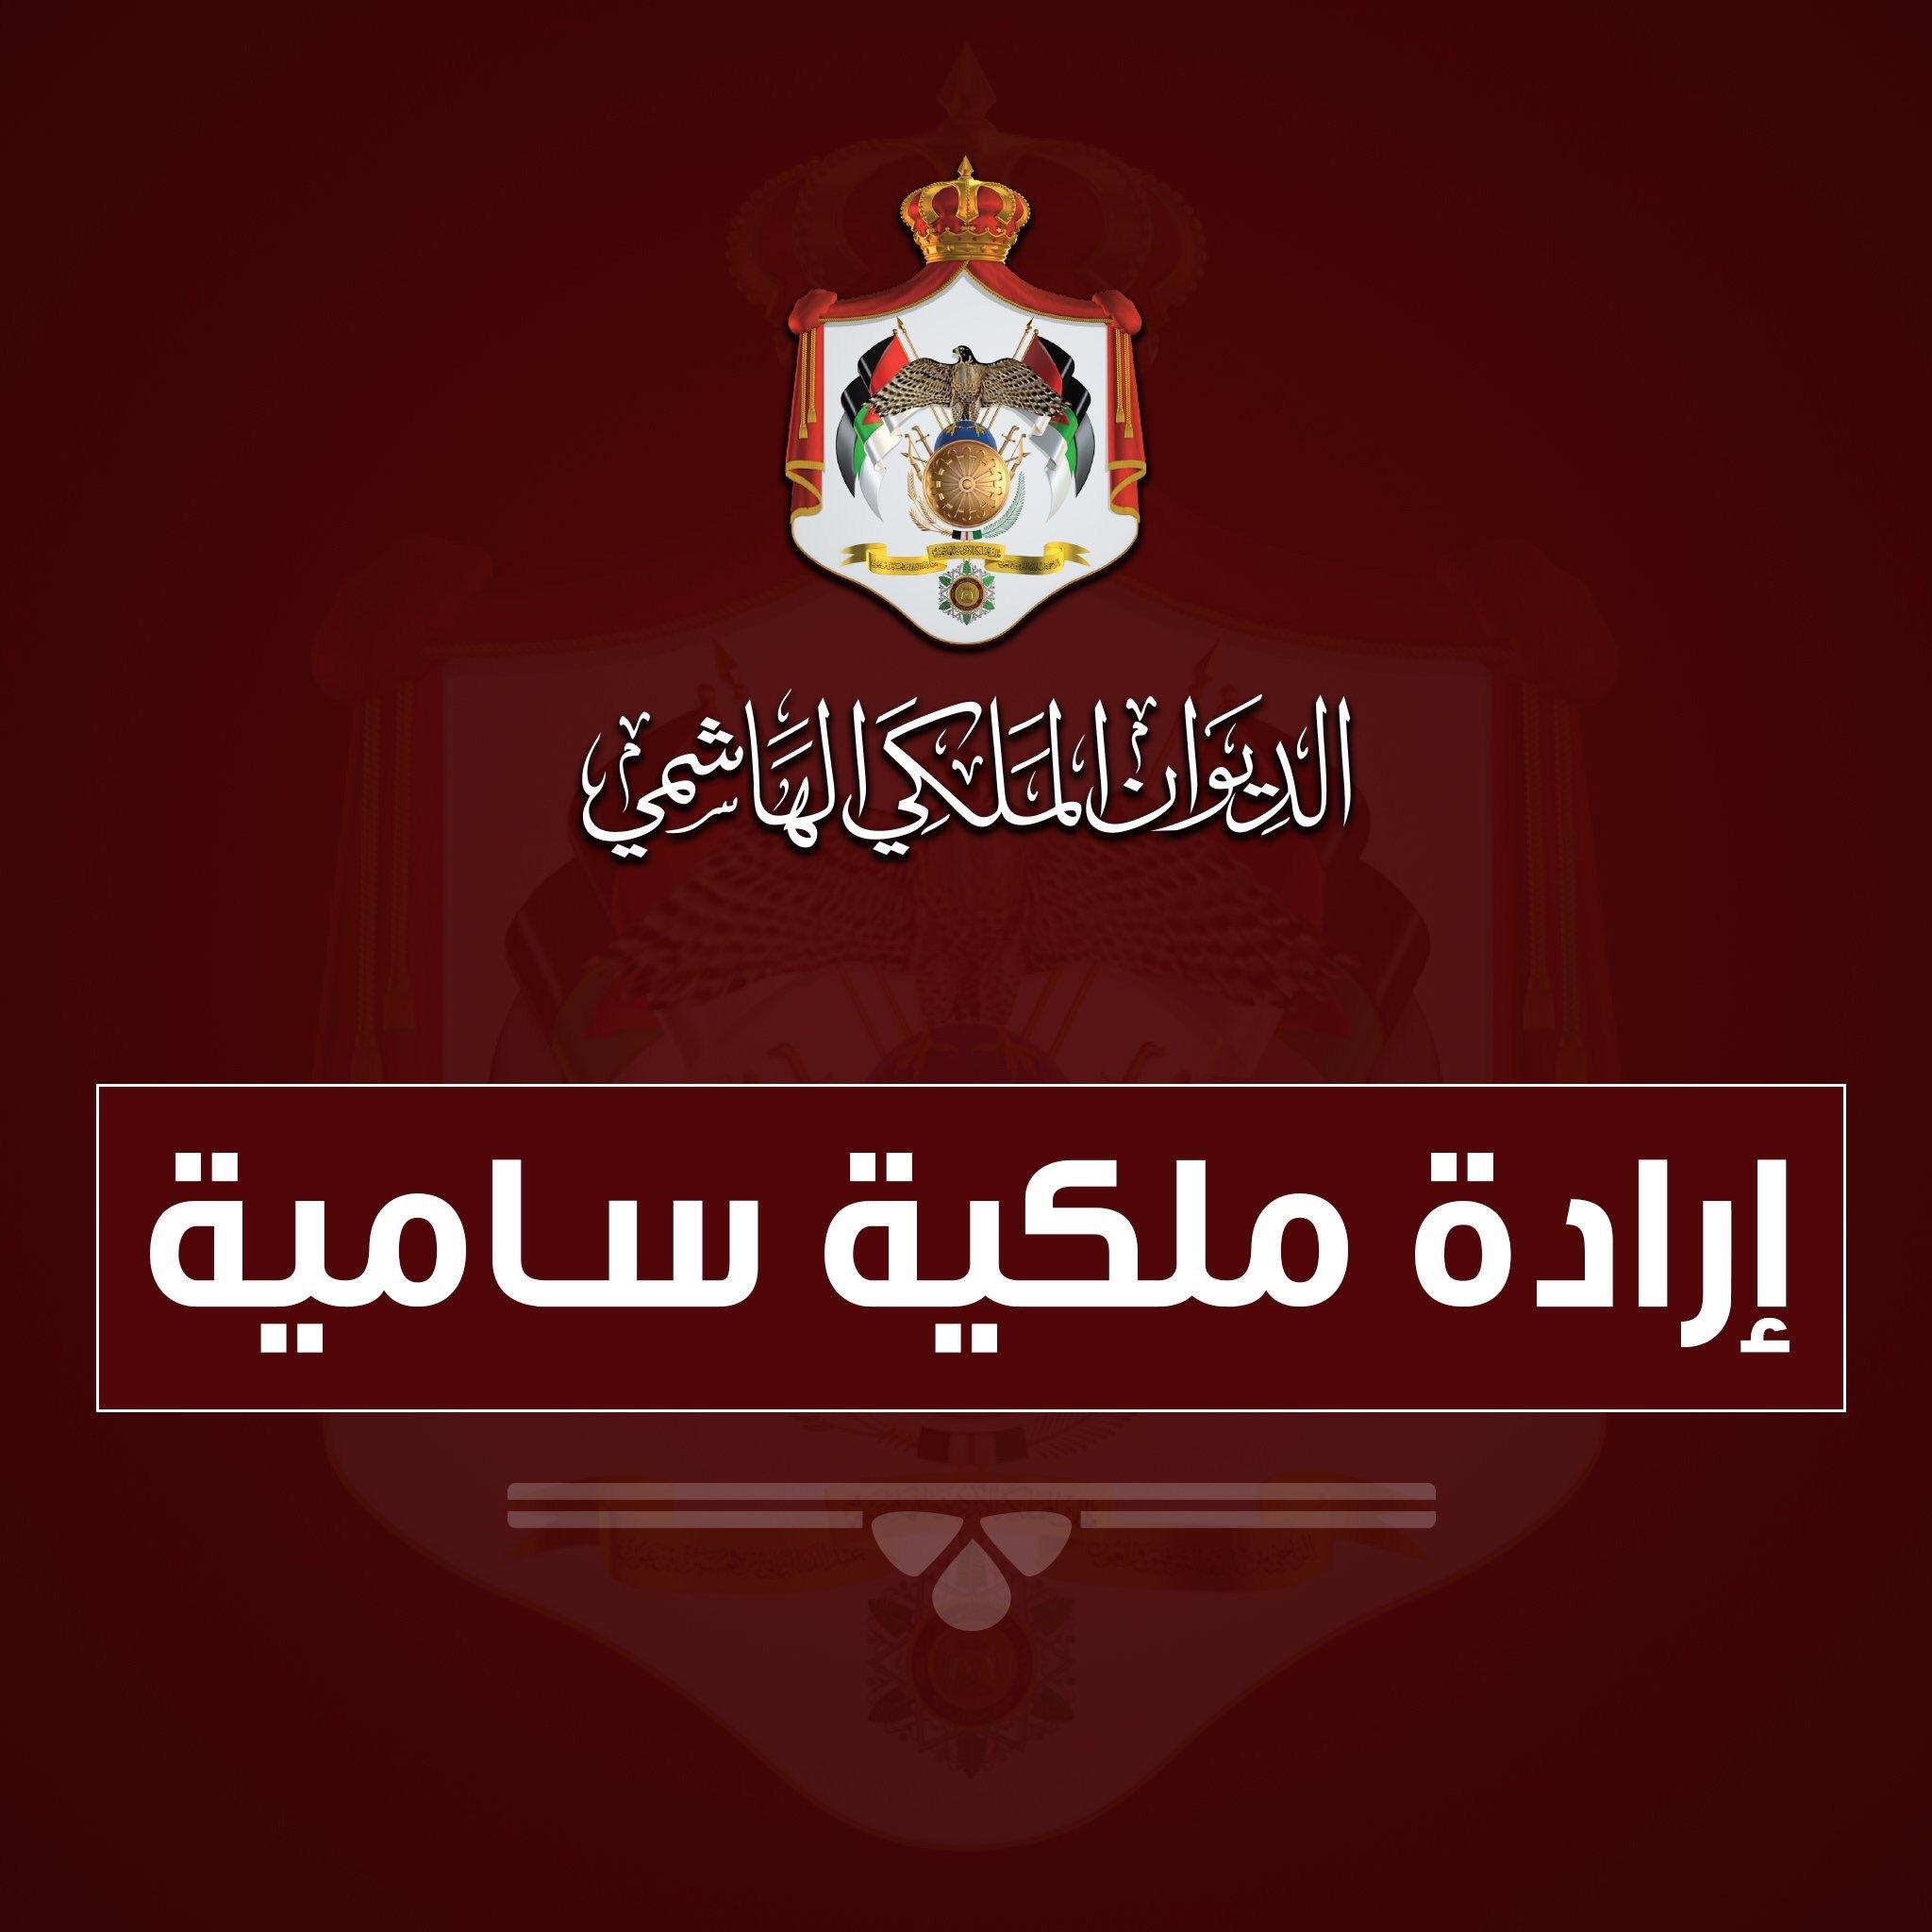 9f2bfe378 هوا الأردن الإخباري on Twitter: